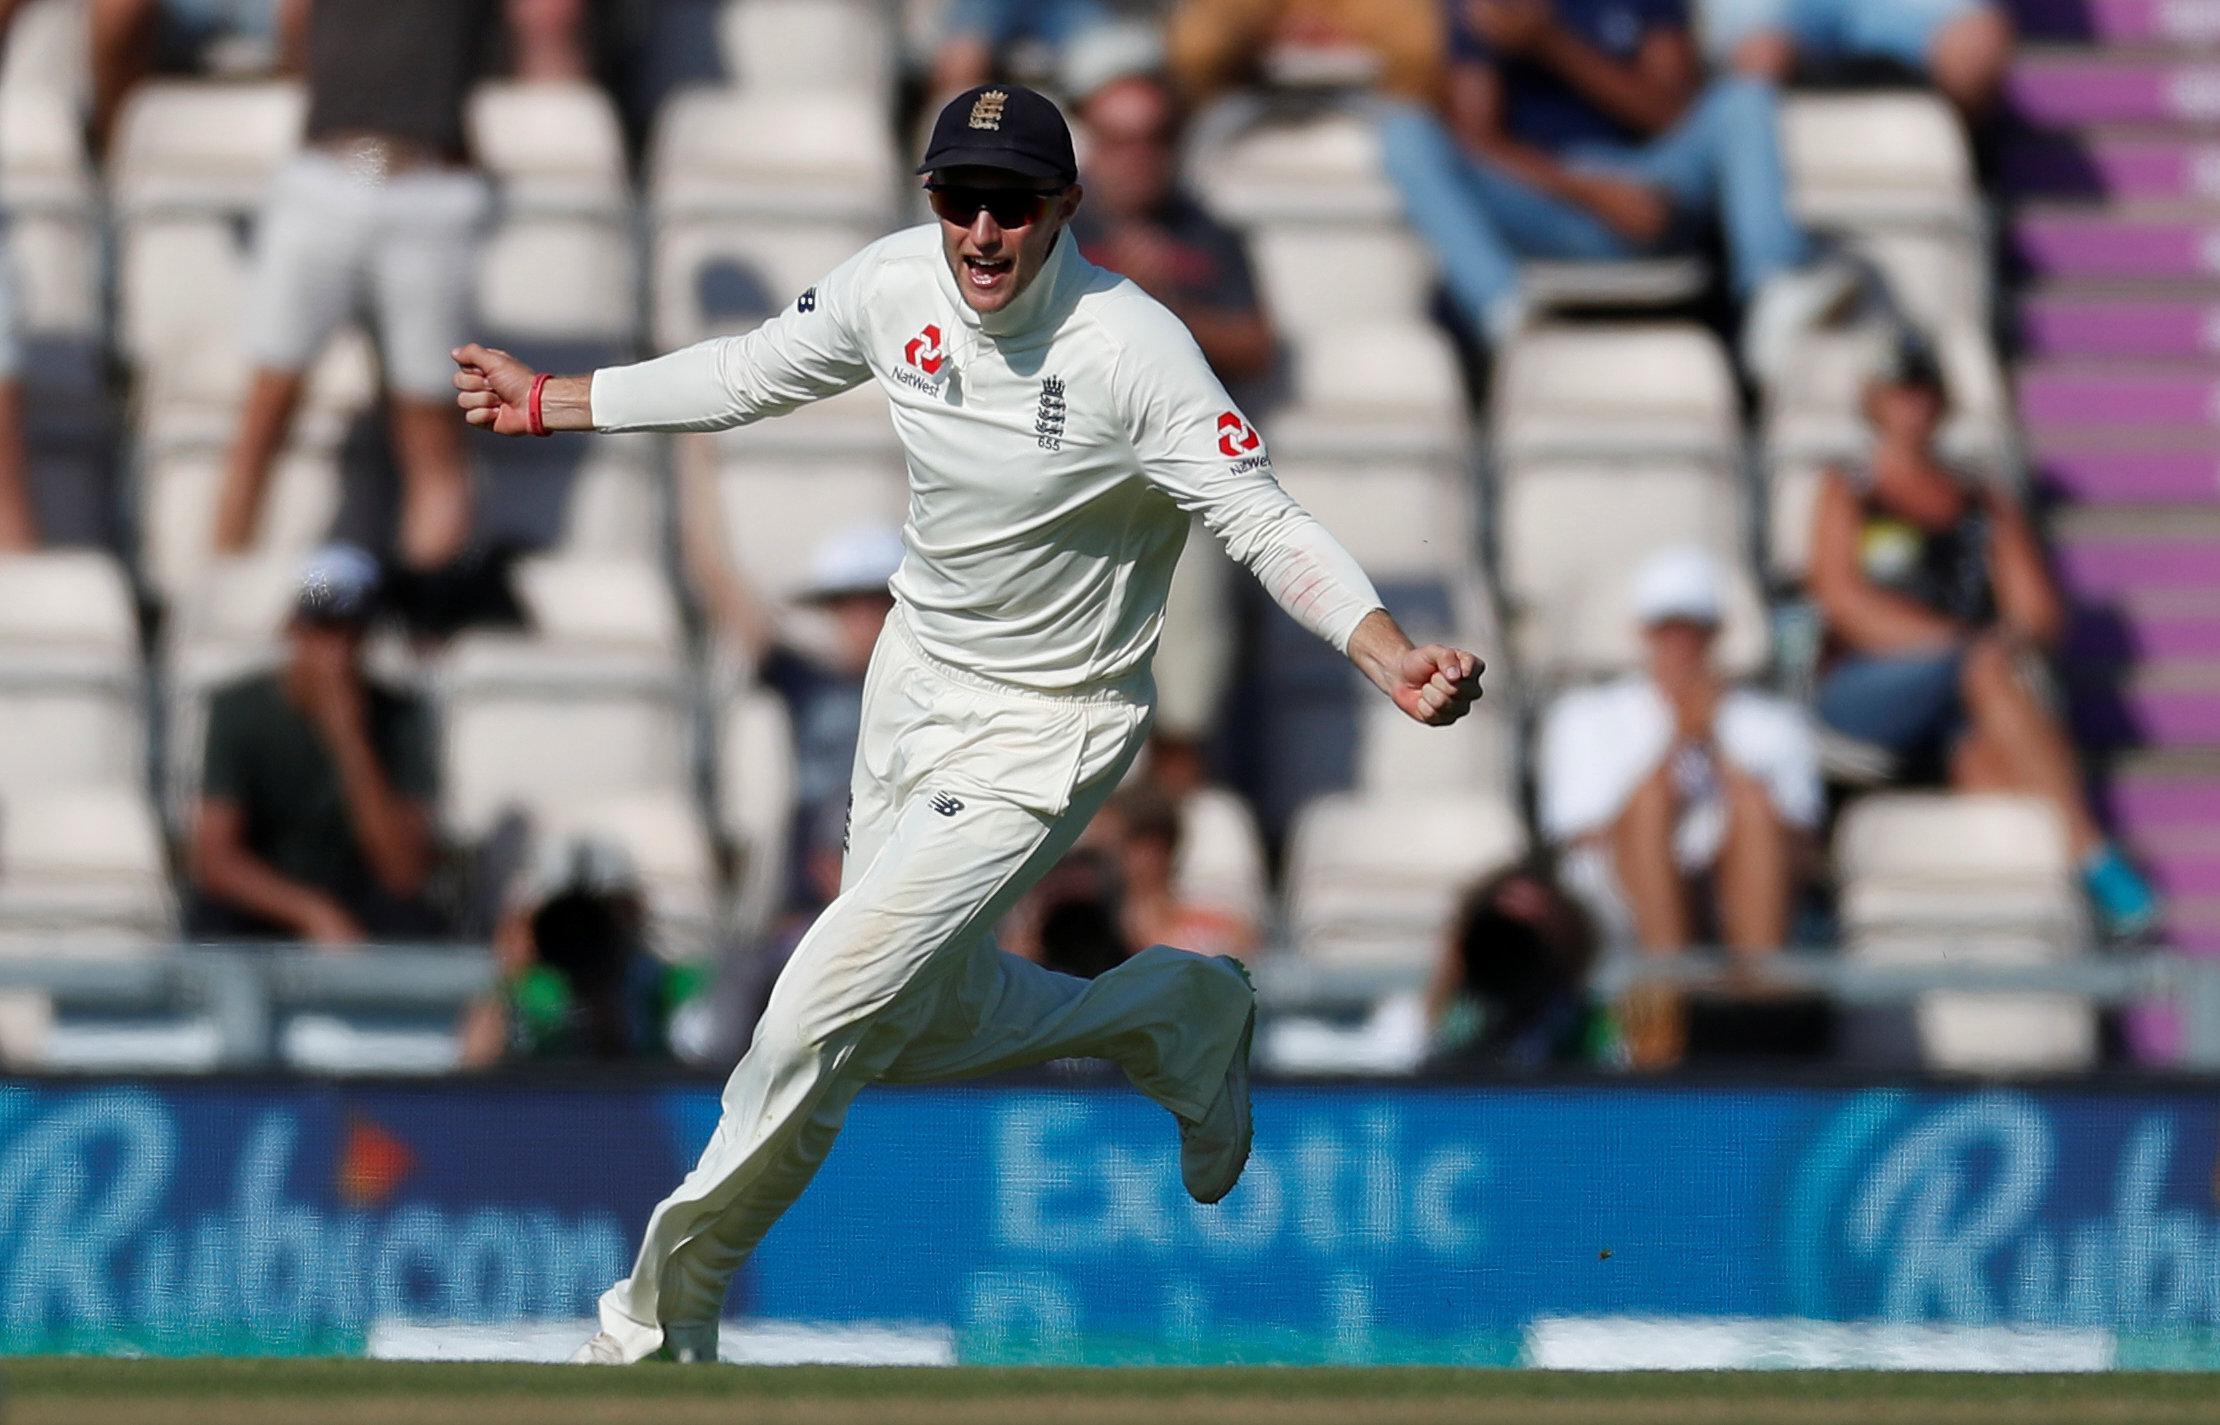 Joe Root celebrates taking the catch to dismiss India's Hardik Pandya